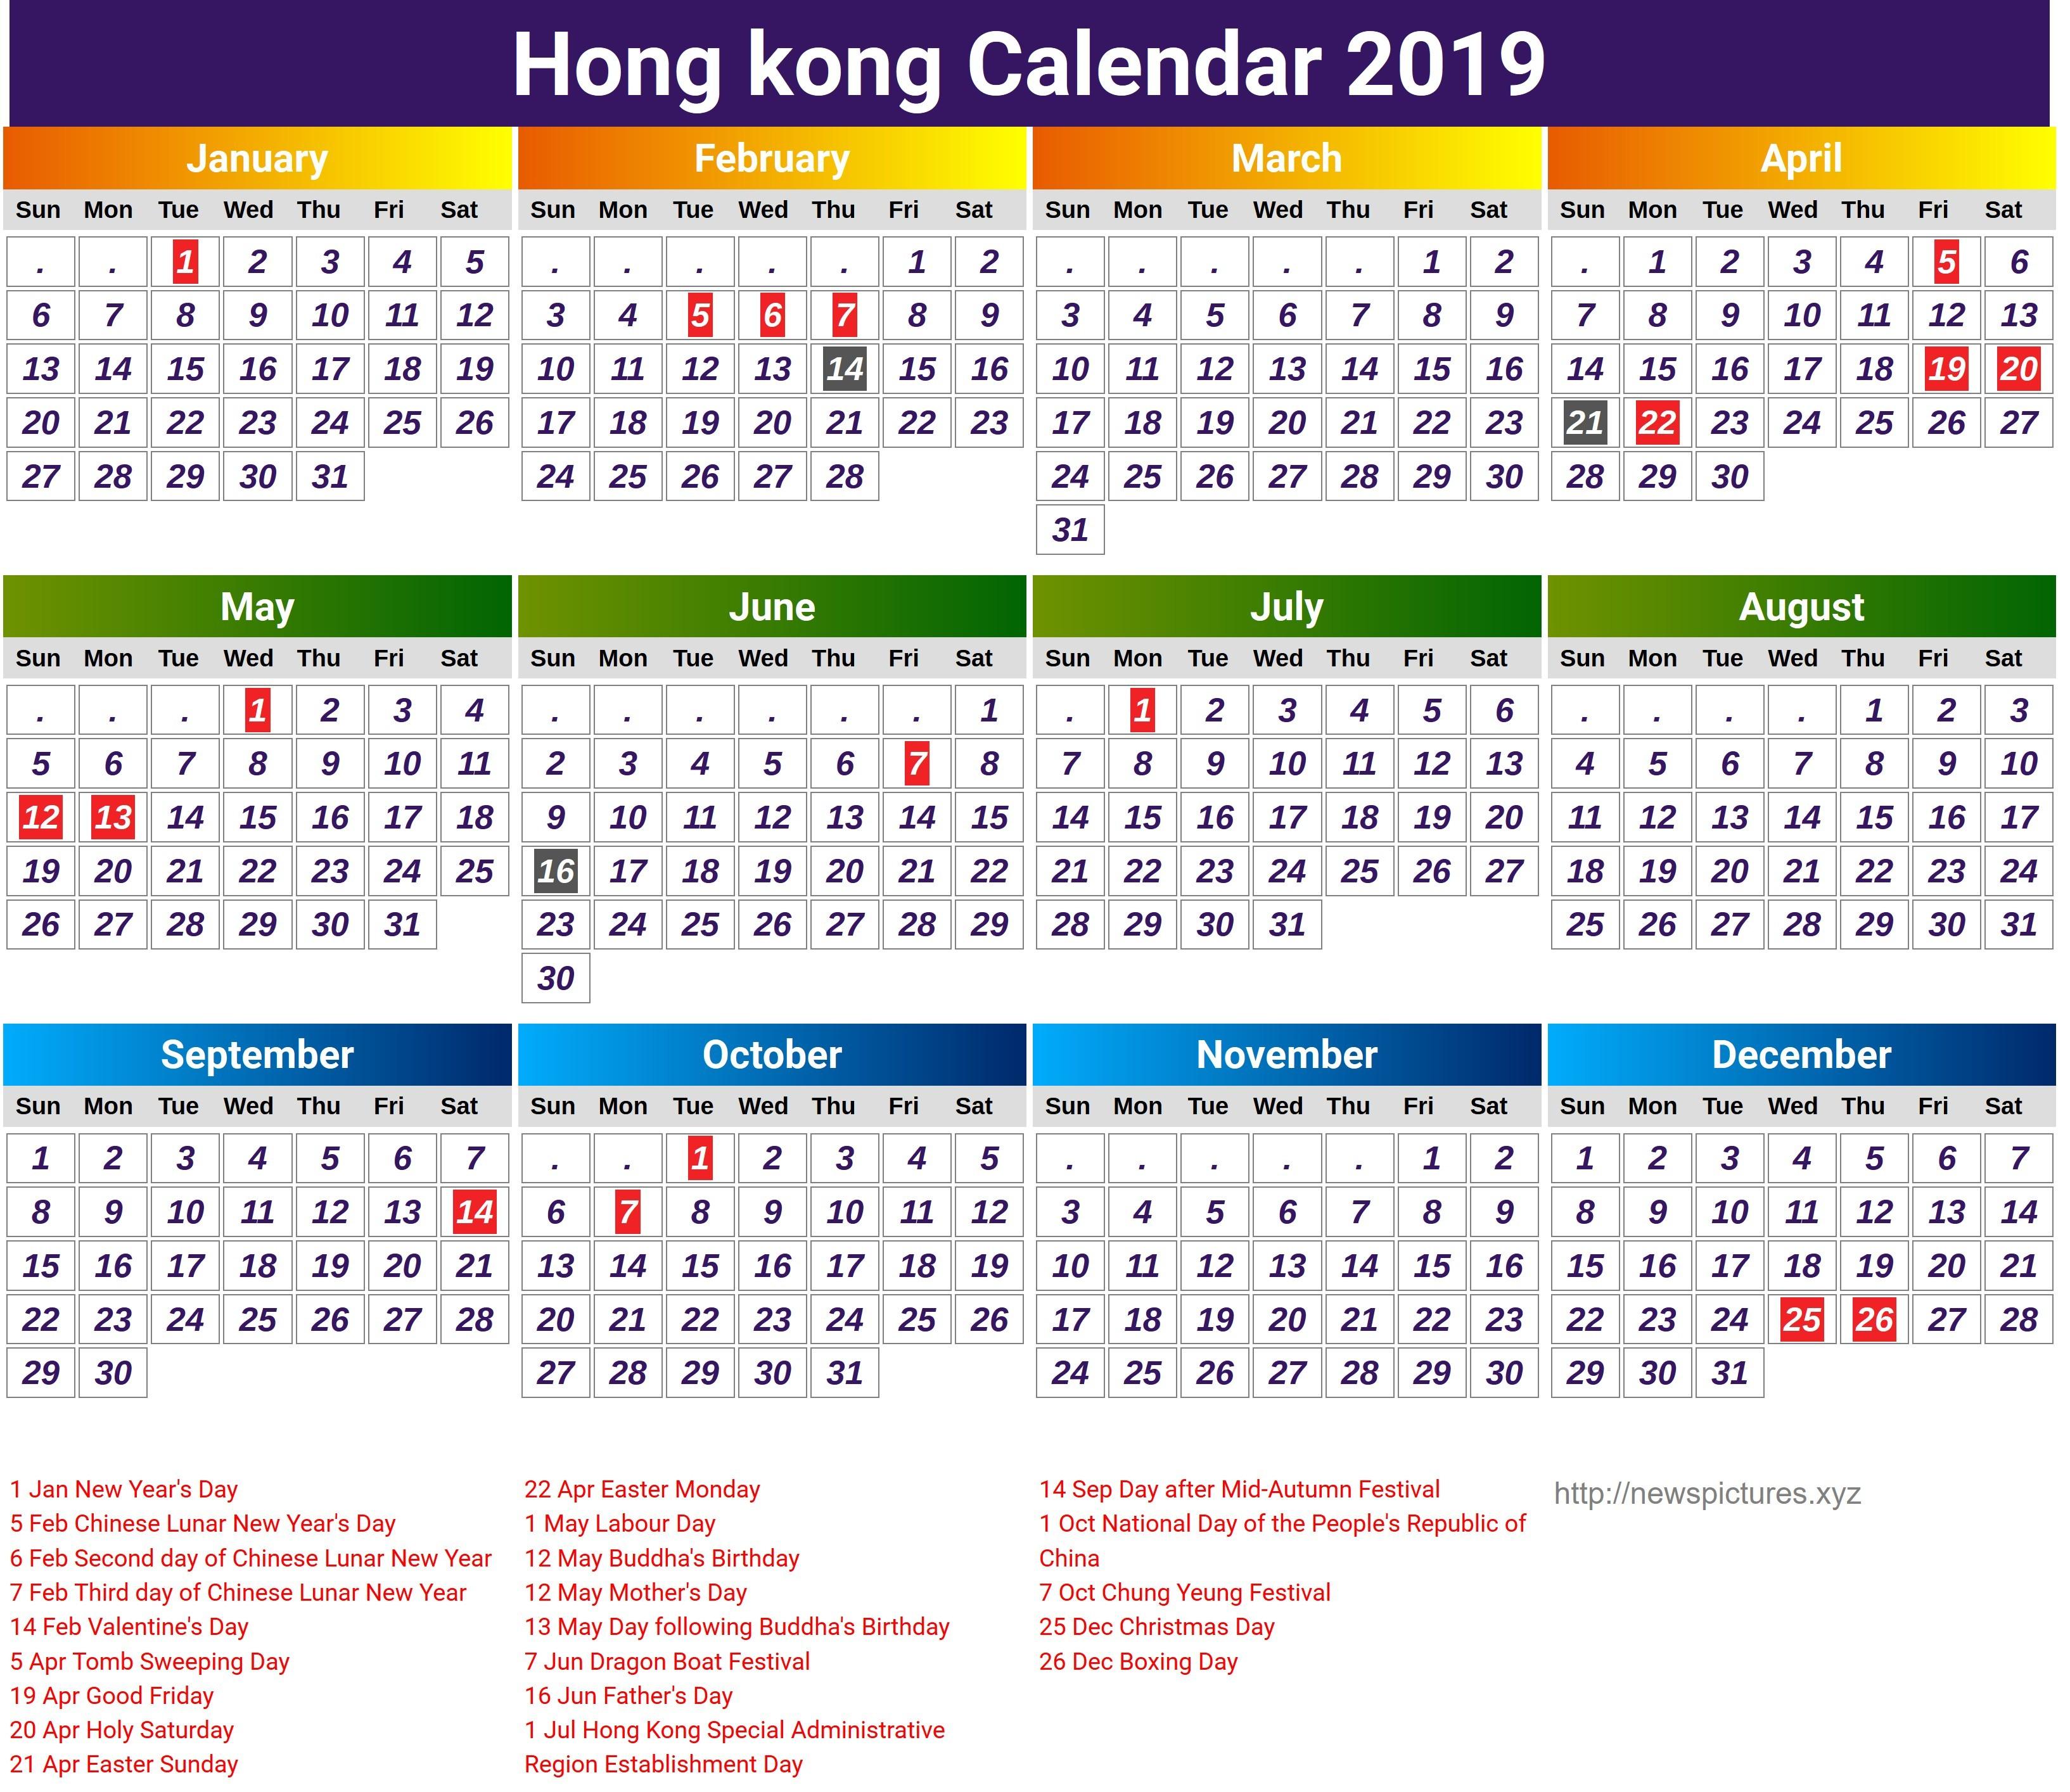 Hongkong Government Calendar 2019 16 Ocps Calendar